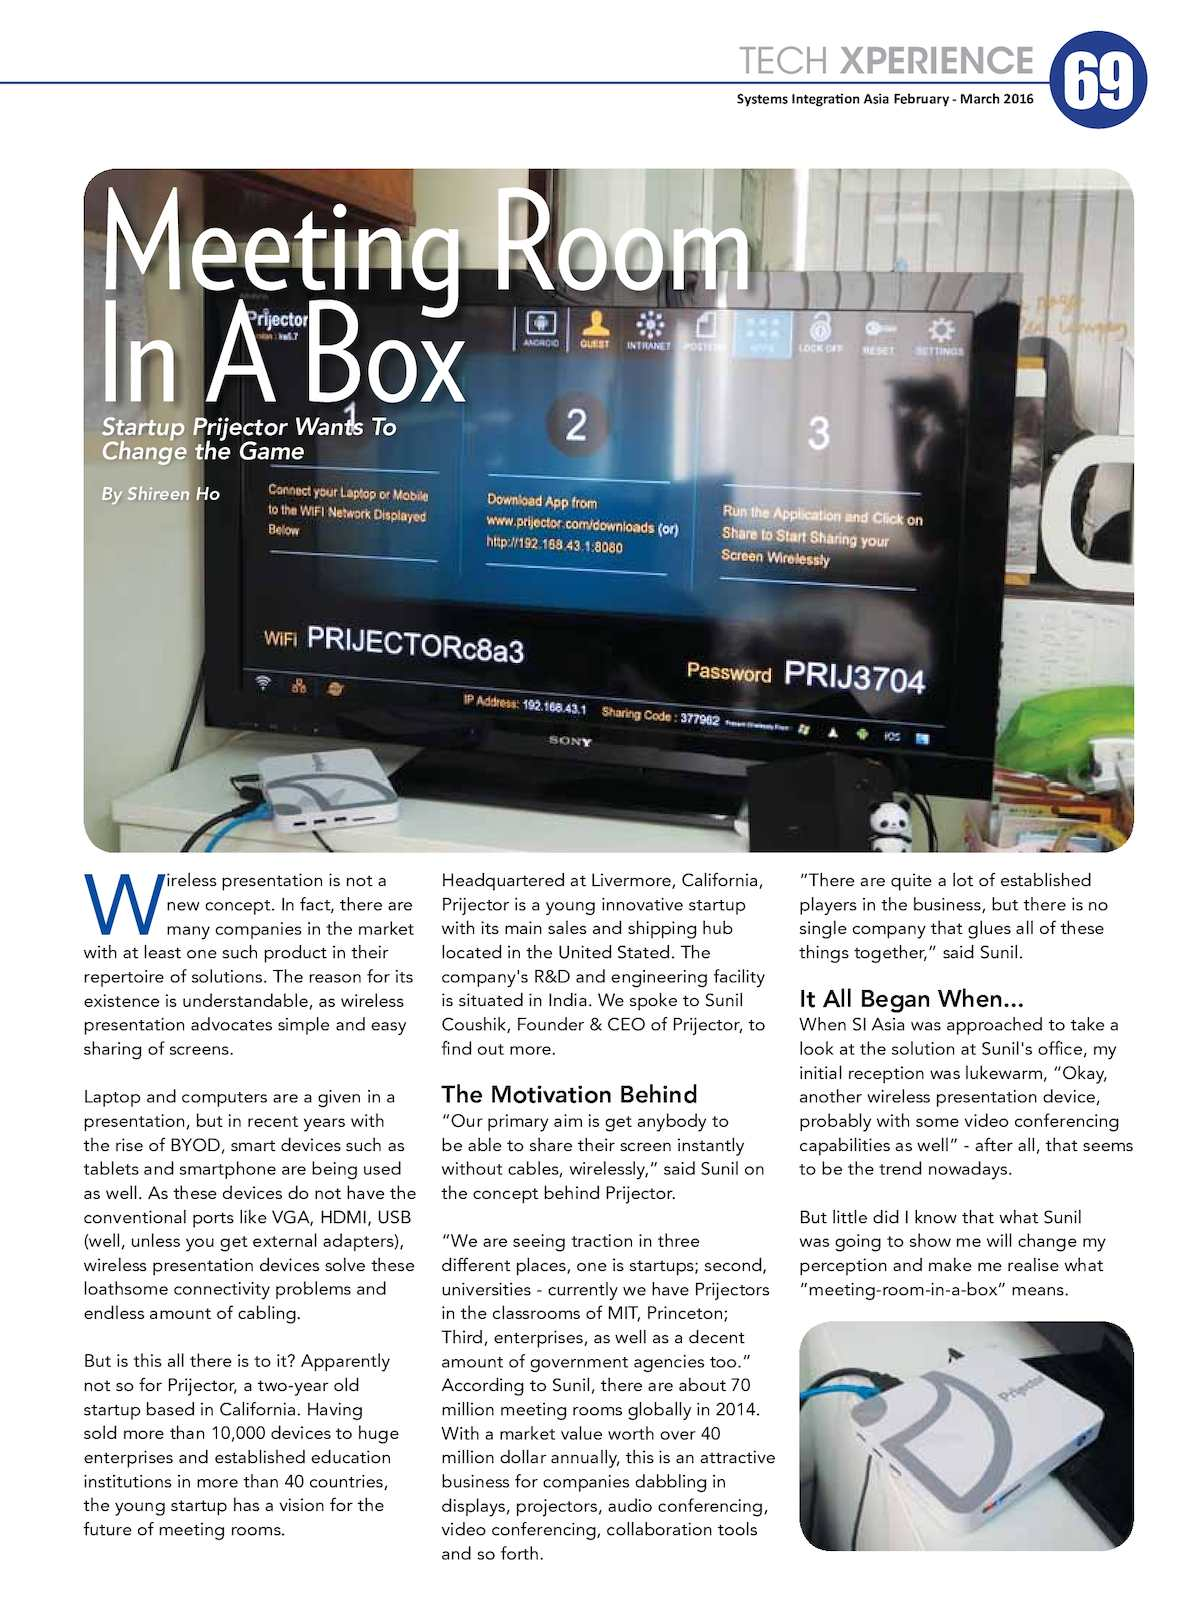 Calaméo - Prijector - Meeting Room in a Device